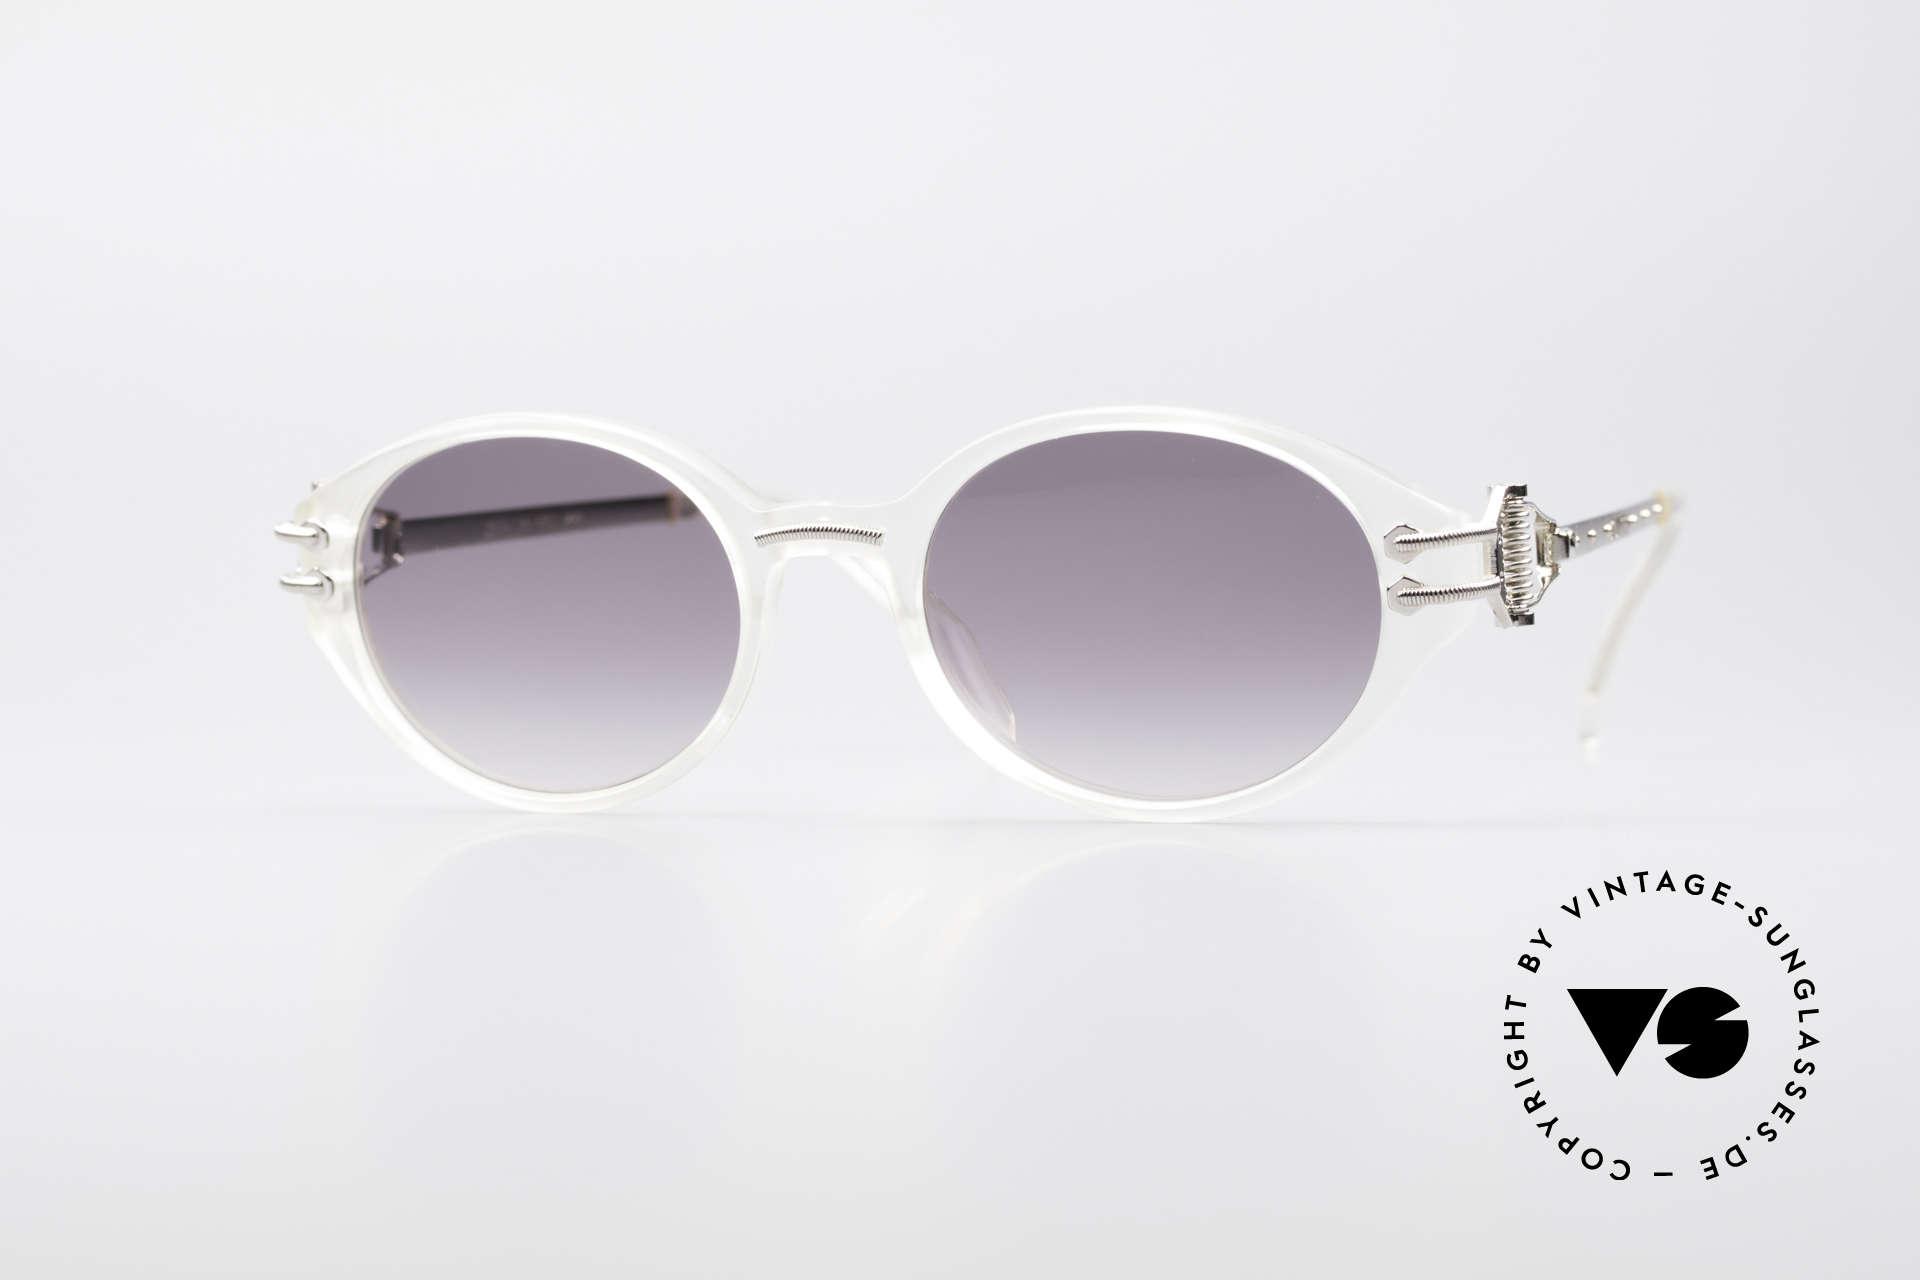 Jean Paul Gaultier 55-5201 90's Steampunk Shades, rare 1990's Jean Paul Gaultier designer sunglasses, Made for Men and Women